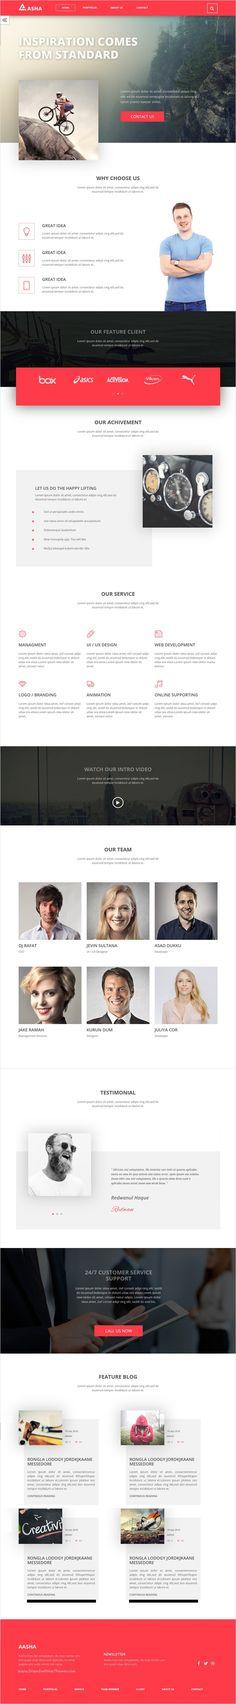 Aasha is modern and elegant design #Bootstrap template for #startups #landing page website download now➩ https://themeforest.net/item/aasha-agency-landing-page-template/17316388?ref=Datasata